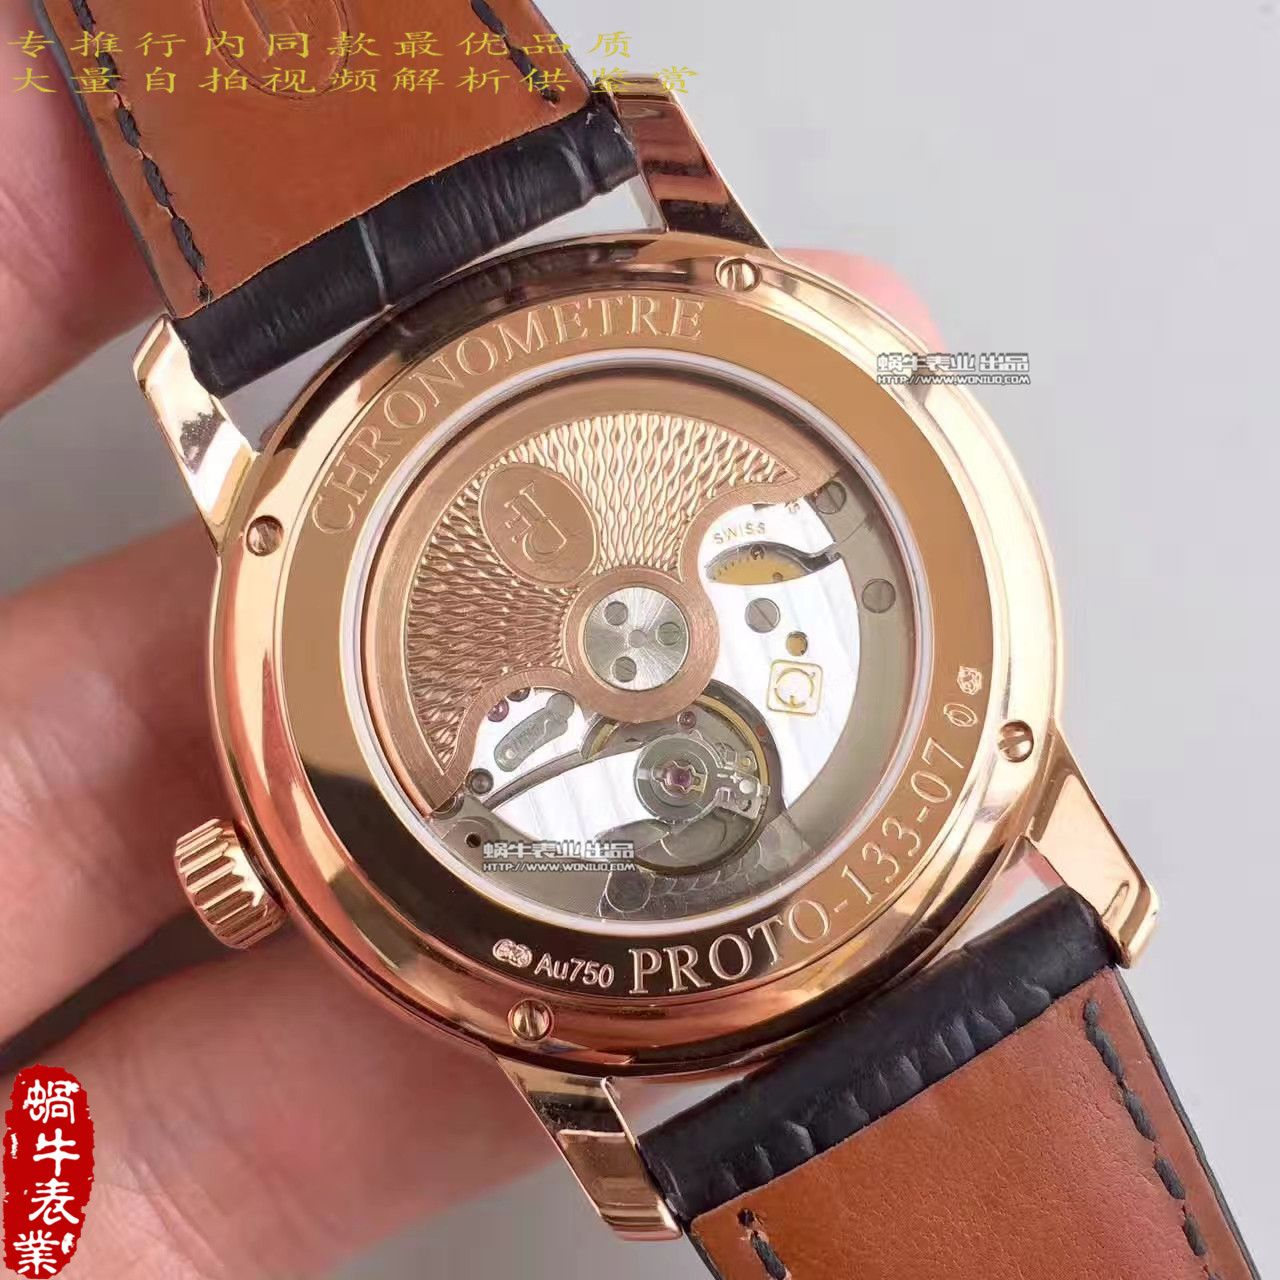 【WF一比一精仿腕表】帕玛强尼TORIC系列PFC423-1601400-HA1441腕表 / PM033